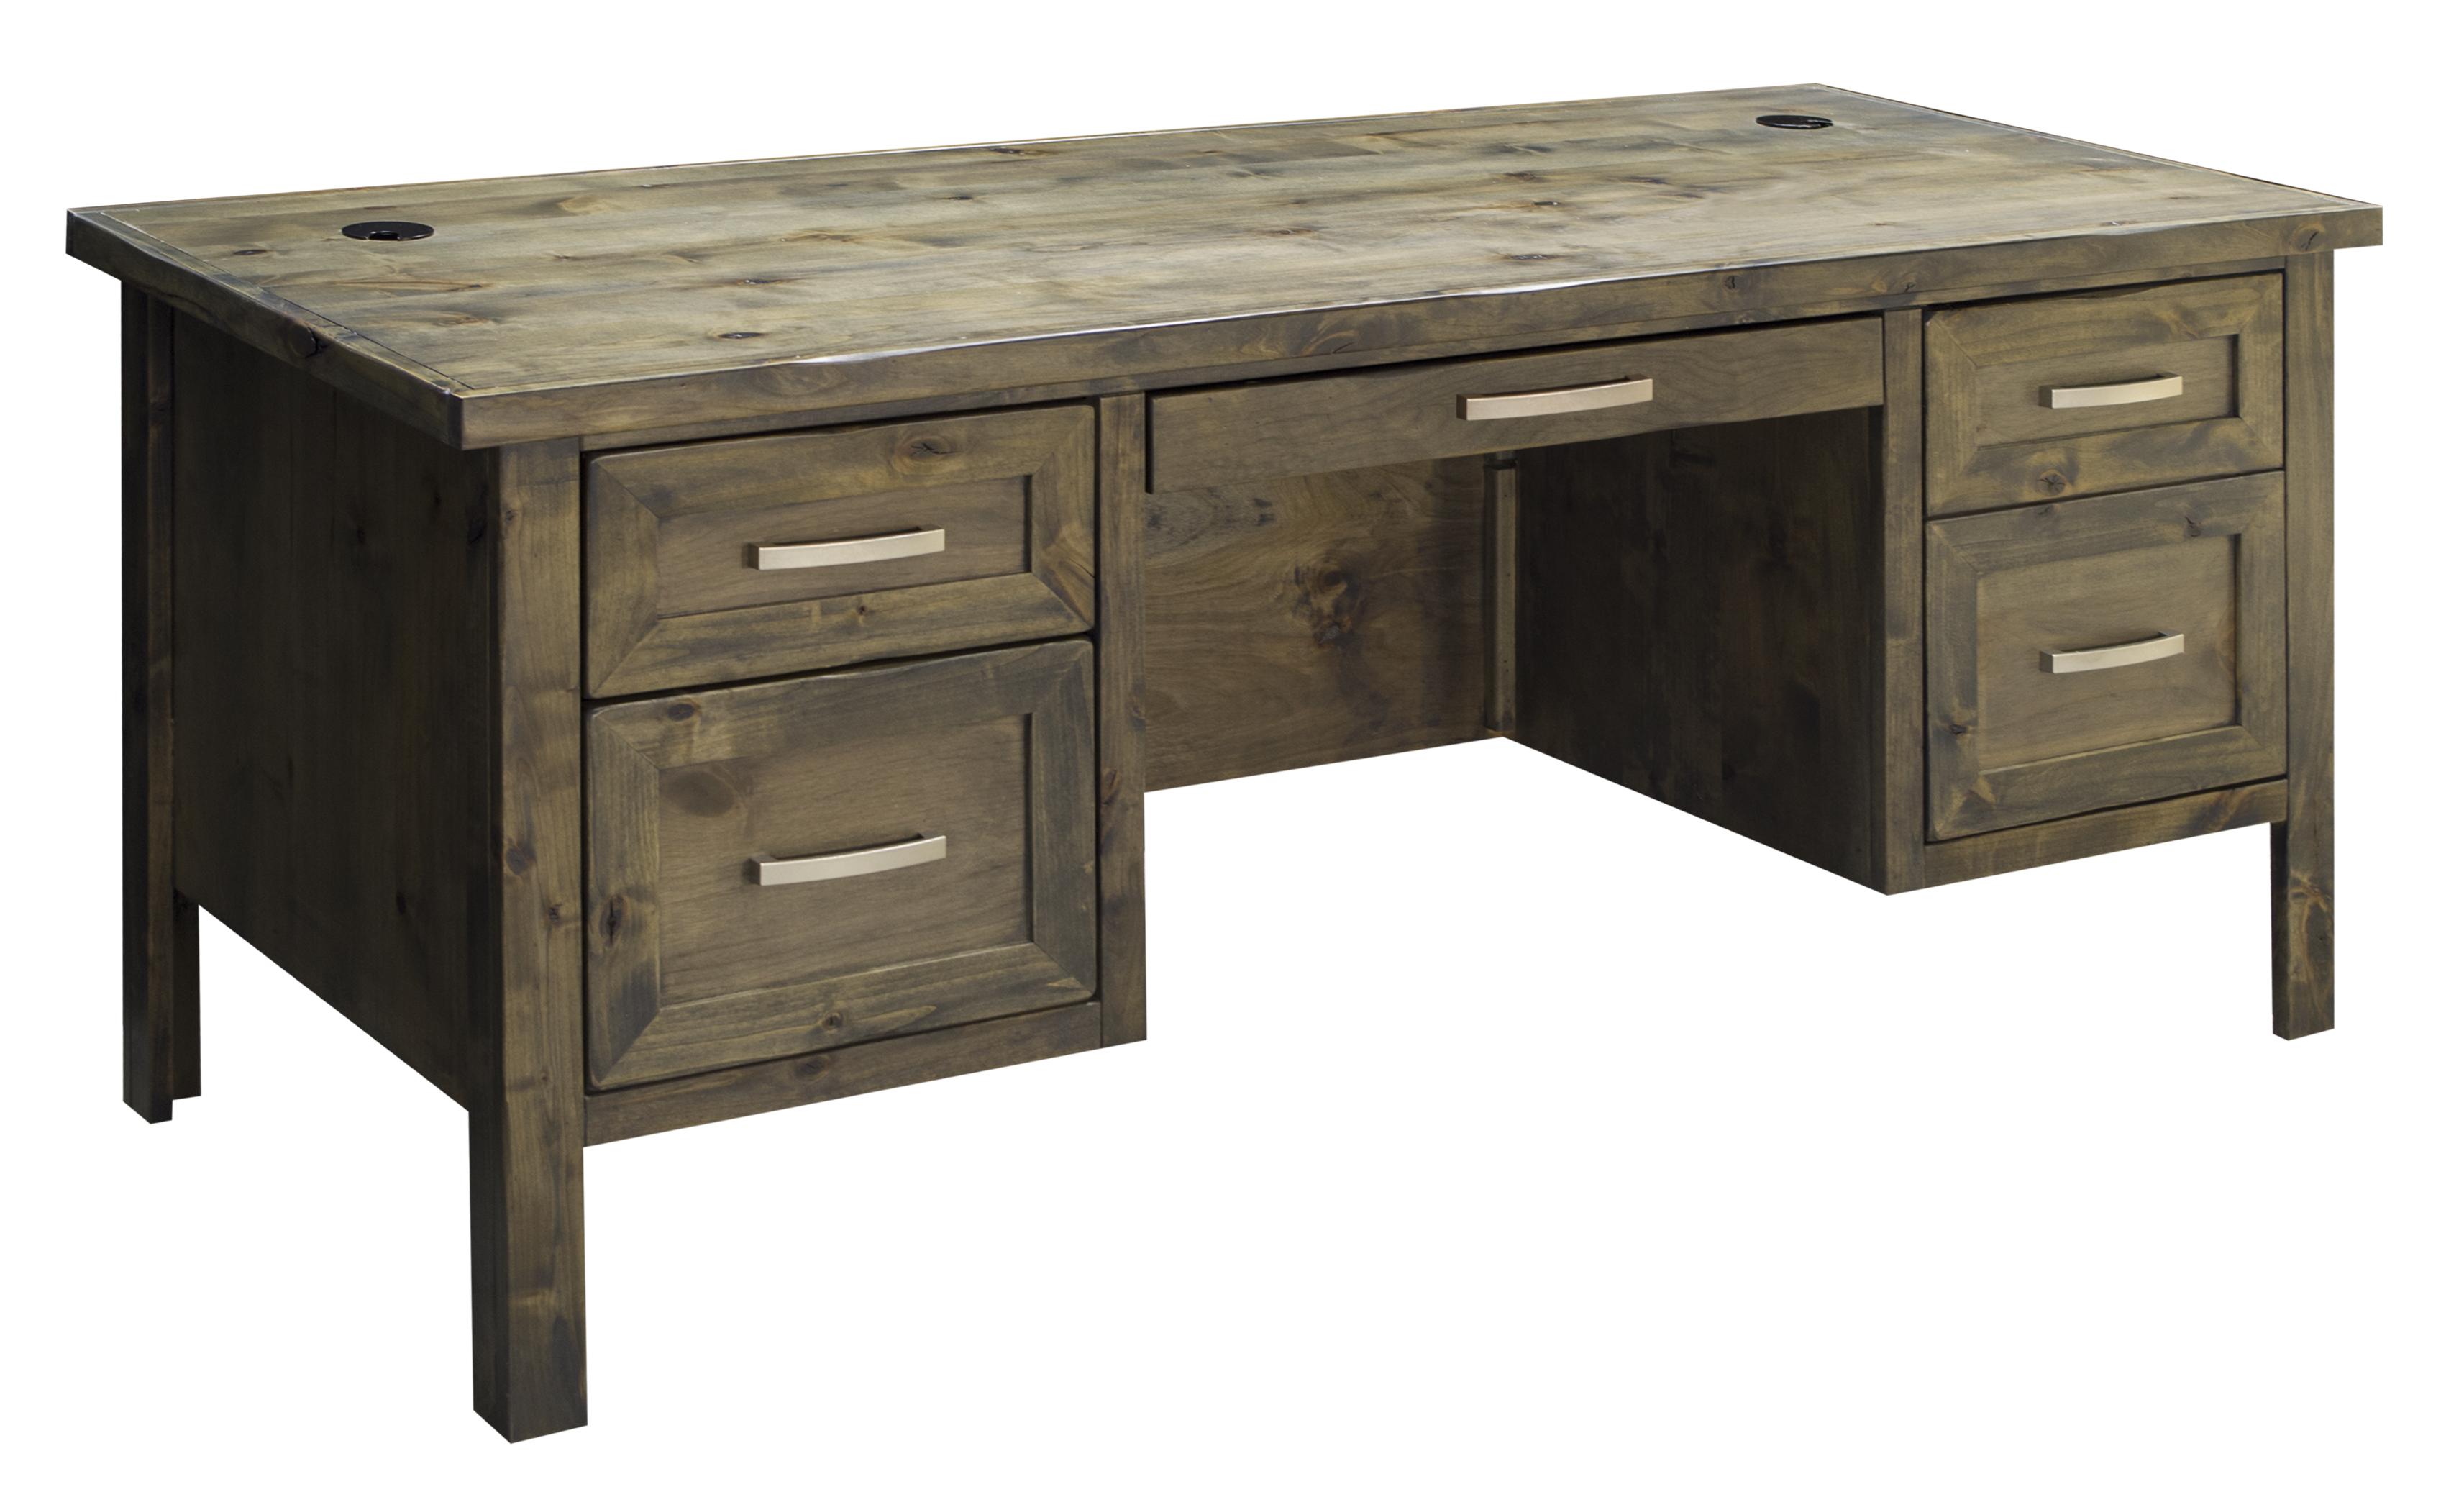 Legends Furniture Joshua Creek Joshua Creek Executive Desk - Item Number: JC6270-BNW